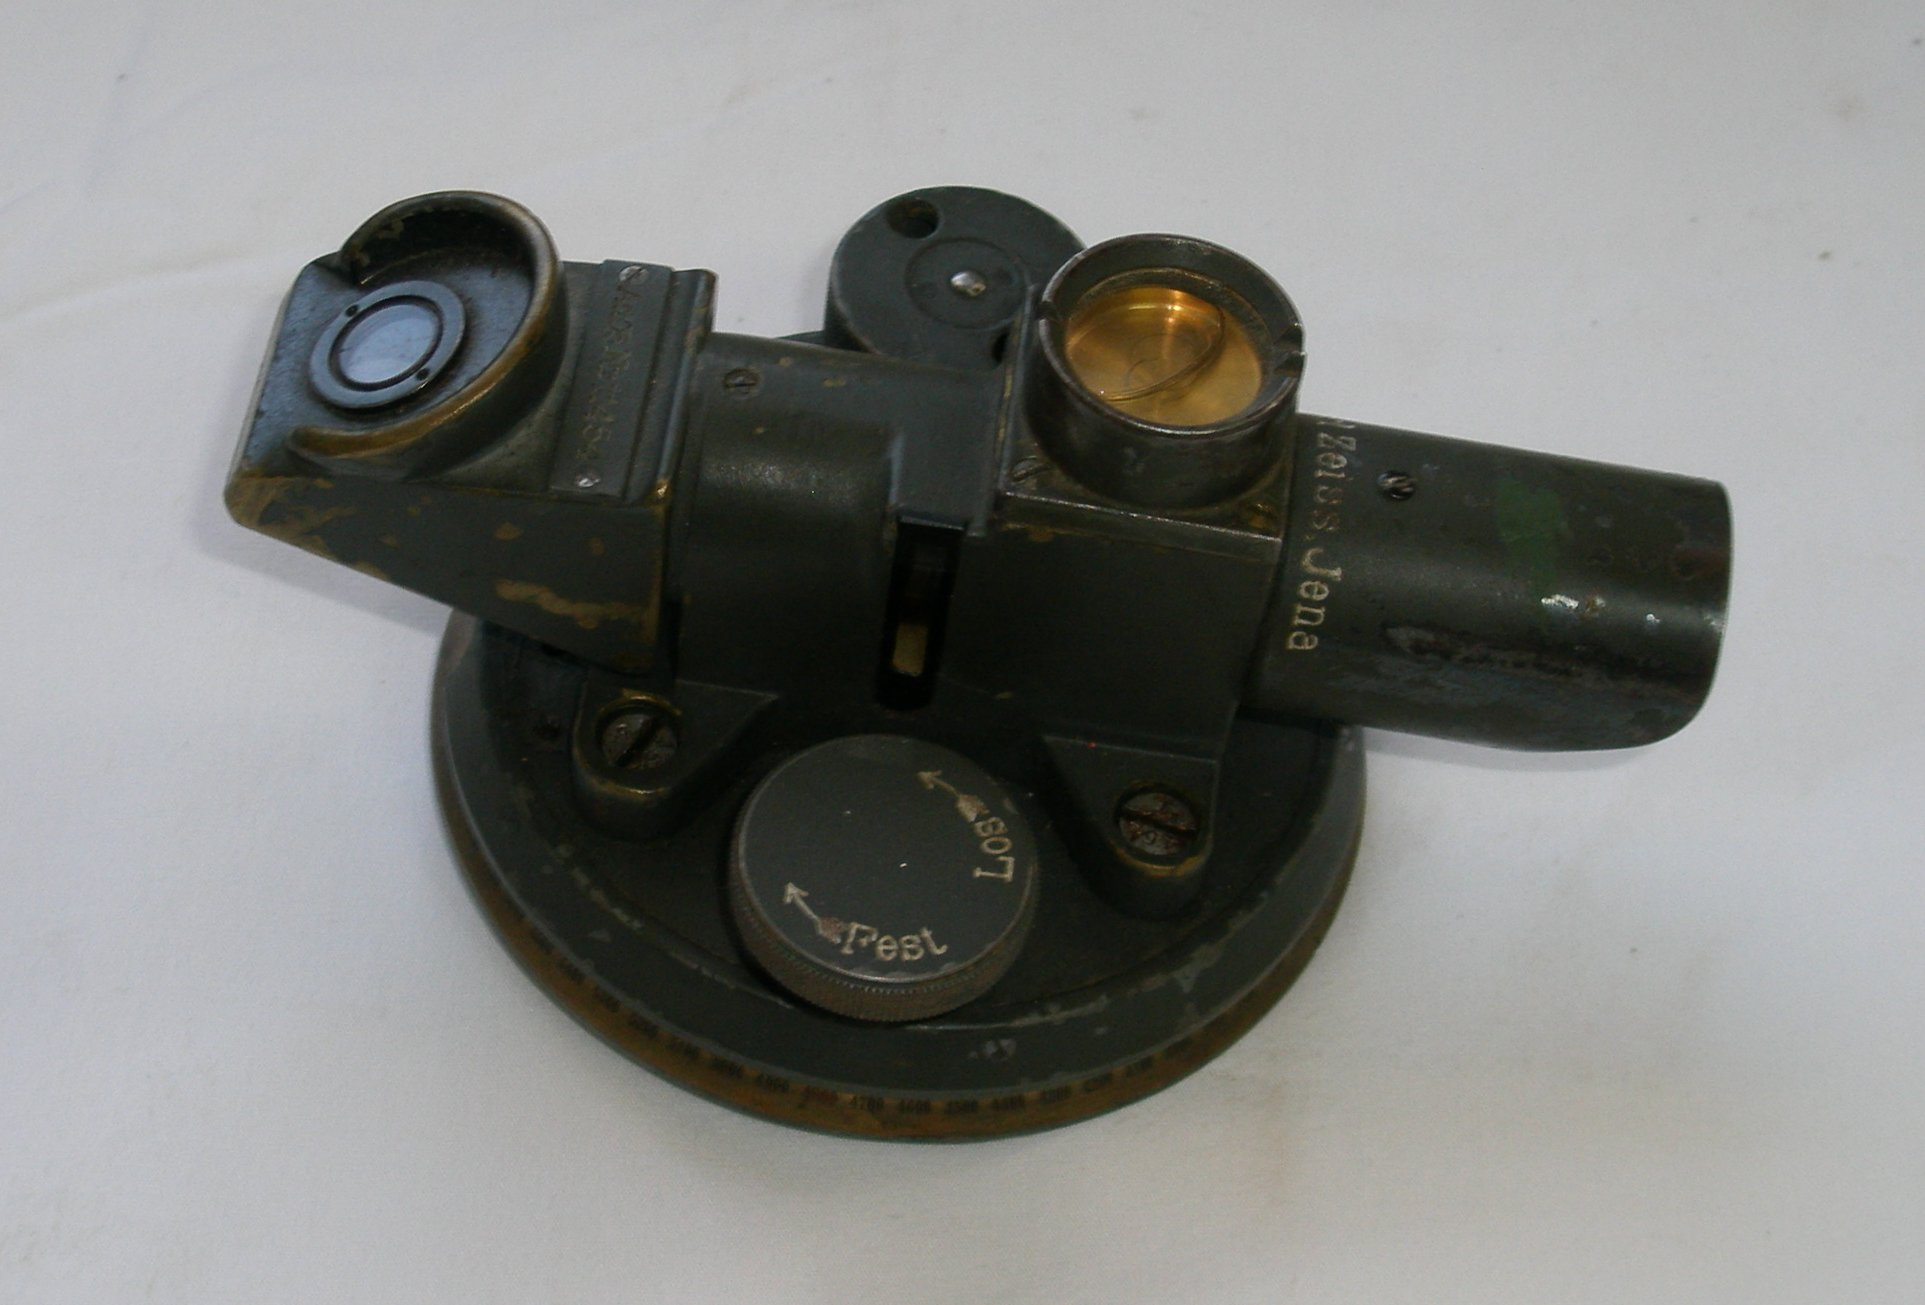 German Foot Amp Field Artillery Related Equipment